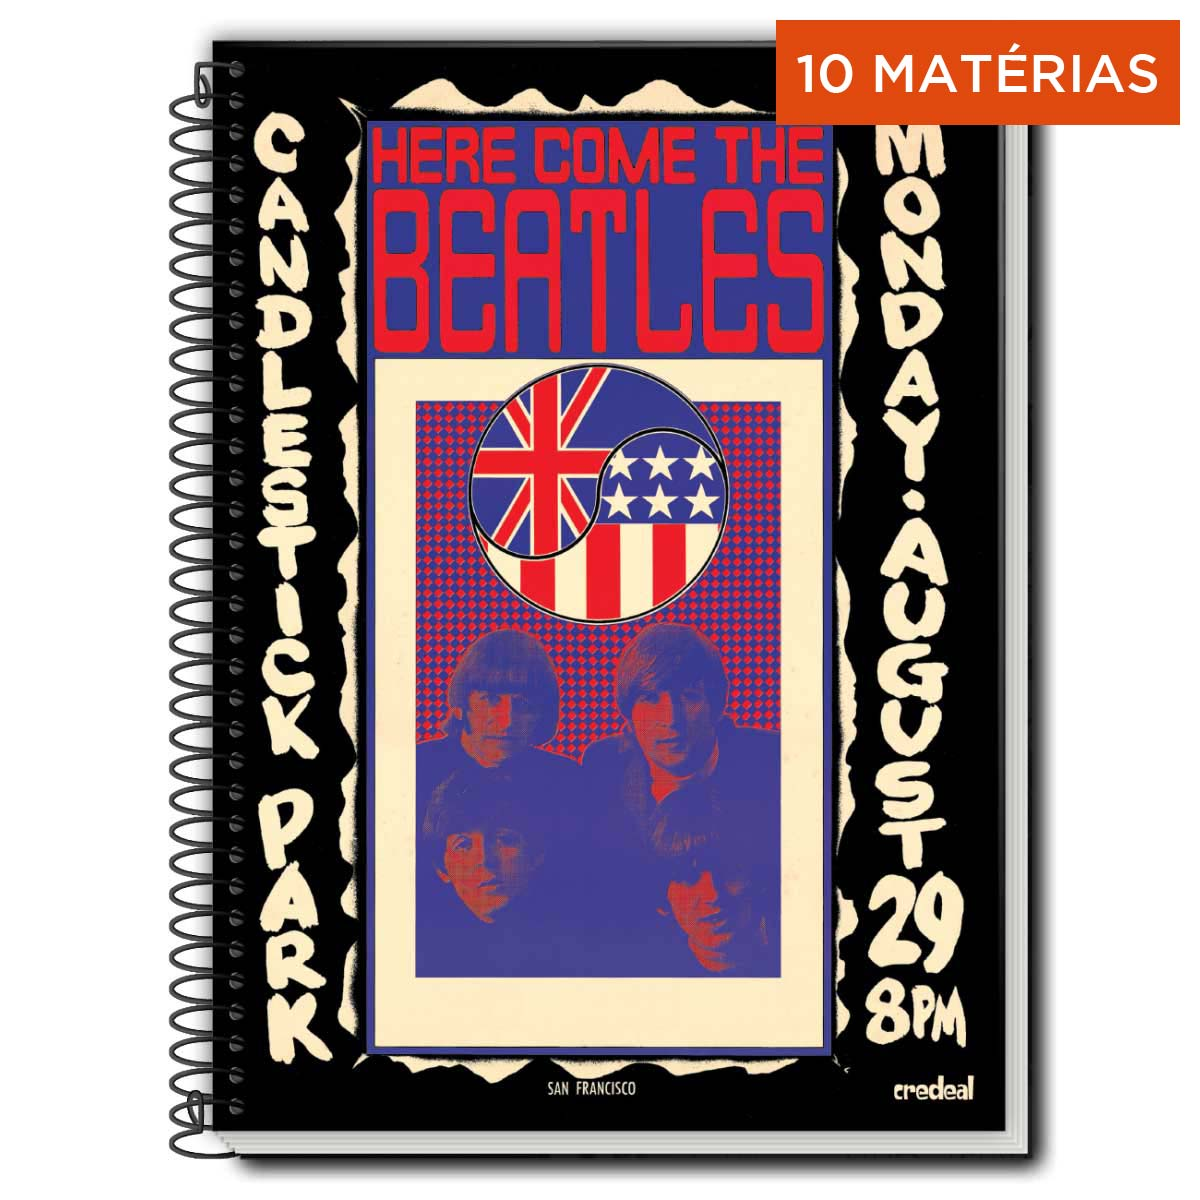 Caderno The Beatles Here Come The Beatles 10 Matérias